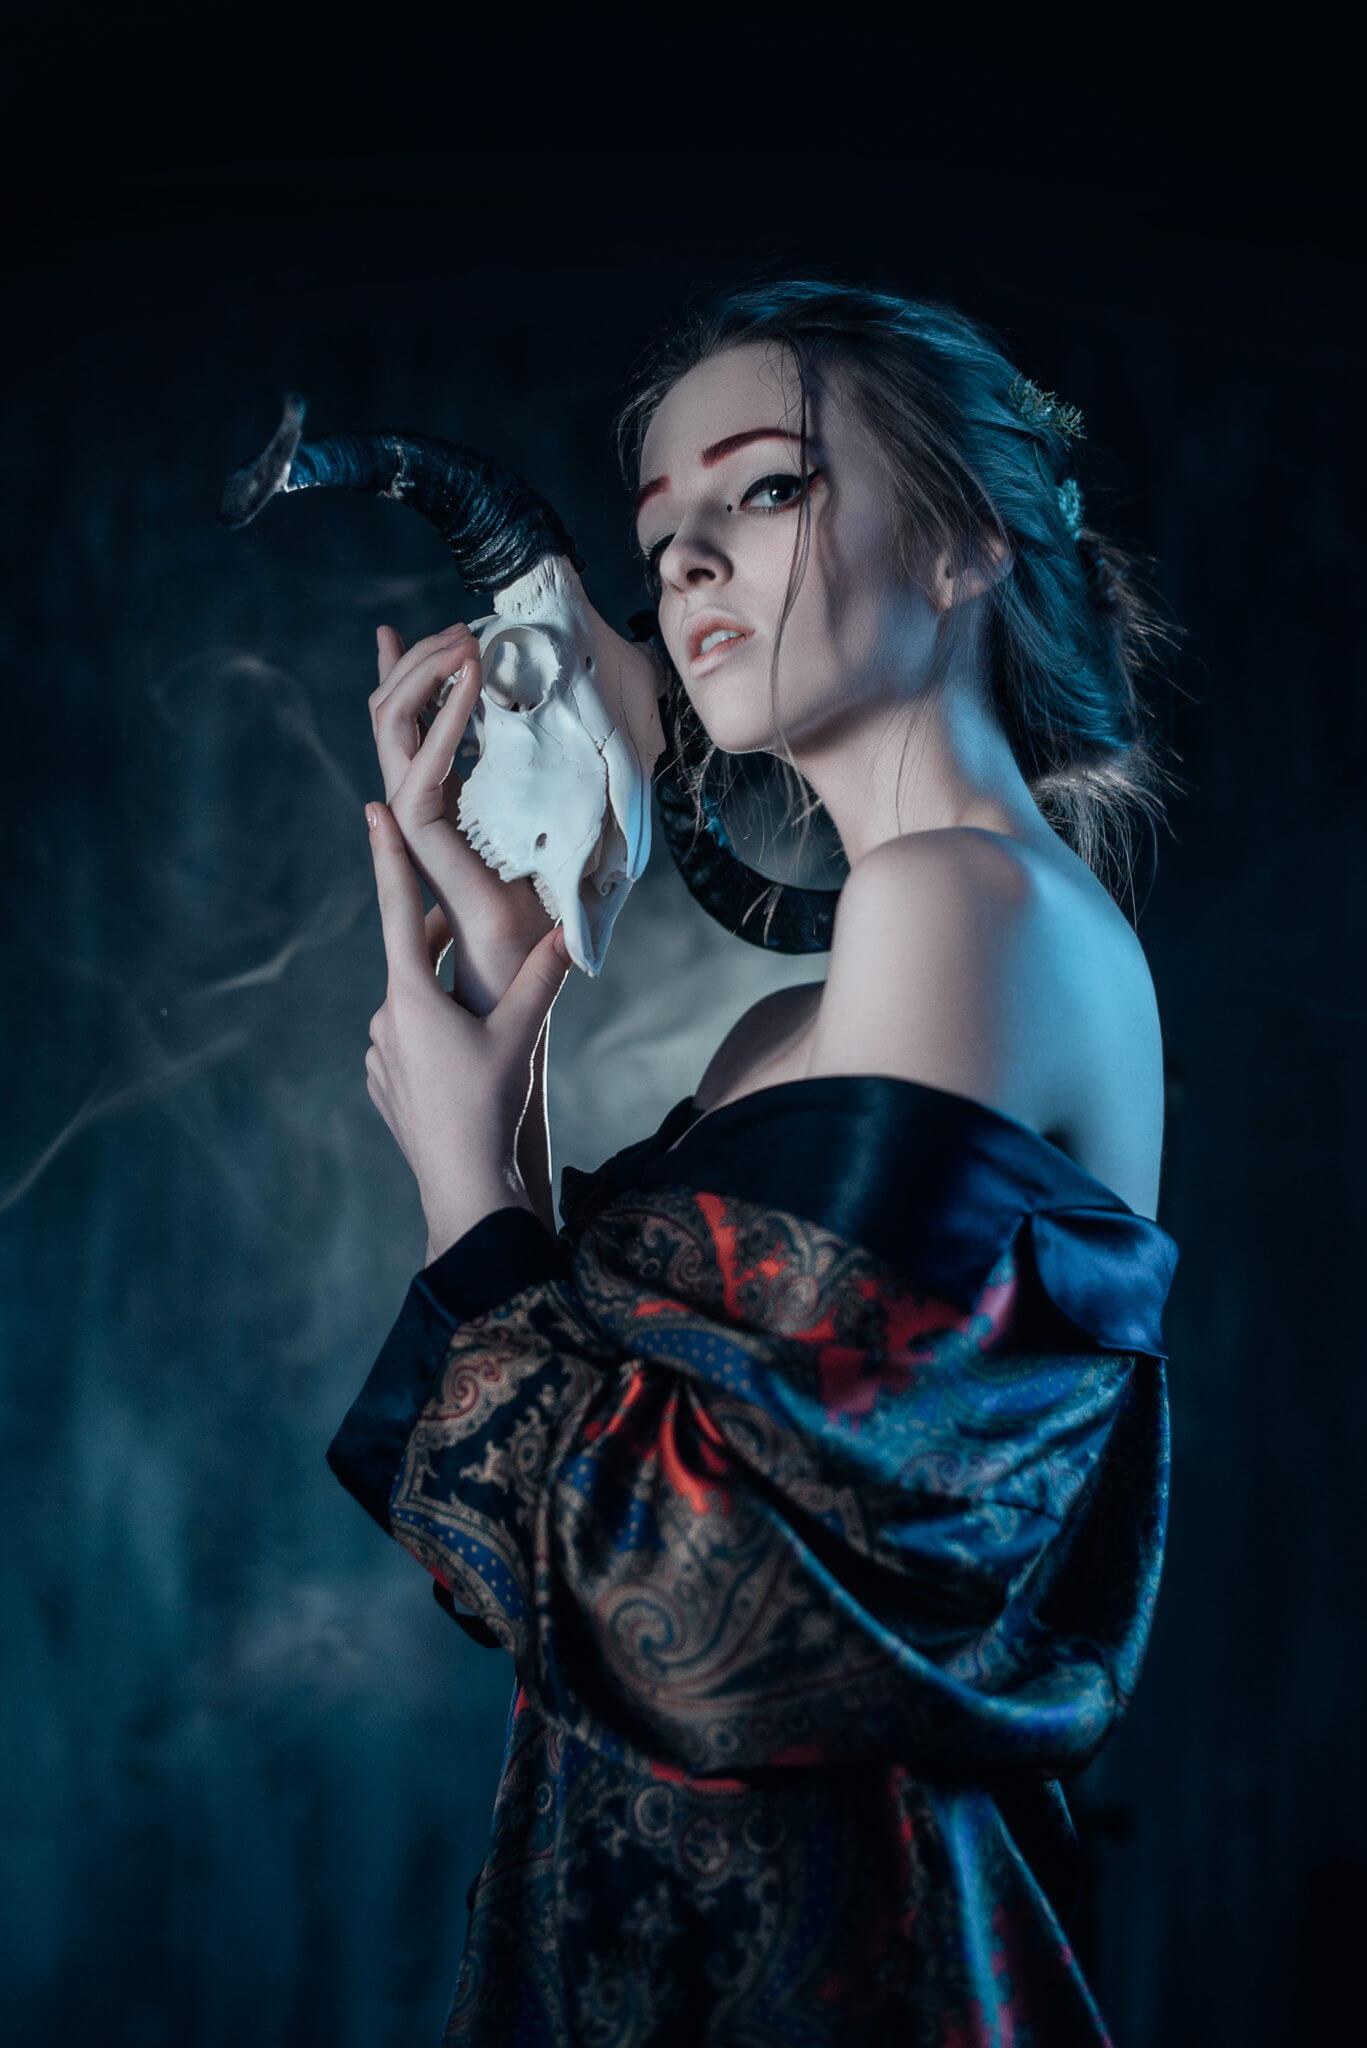 Рекламная съемка для бренда #skull_walkthrough. Ph Безгинова, md Постникова. Девушка с черепом козла в халате, дым